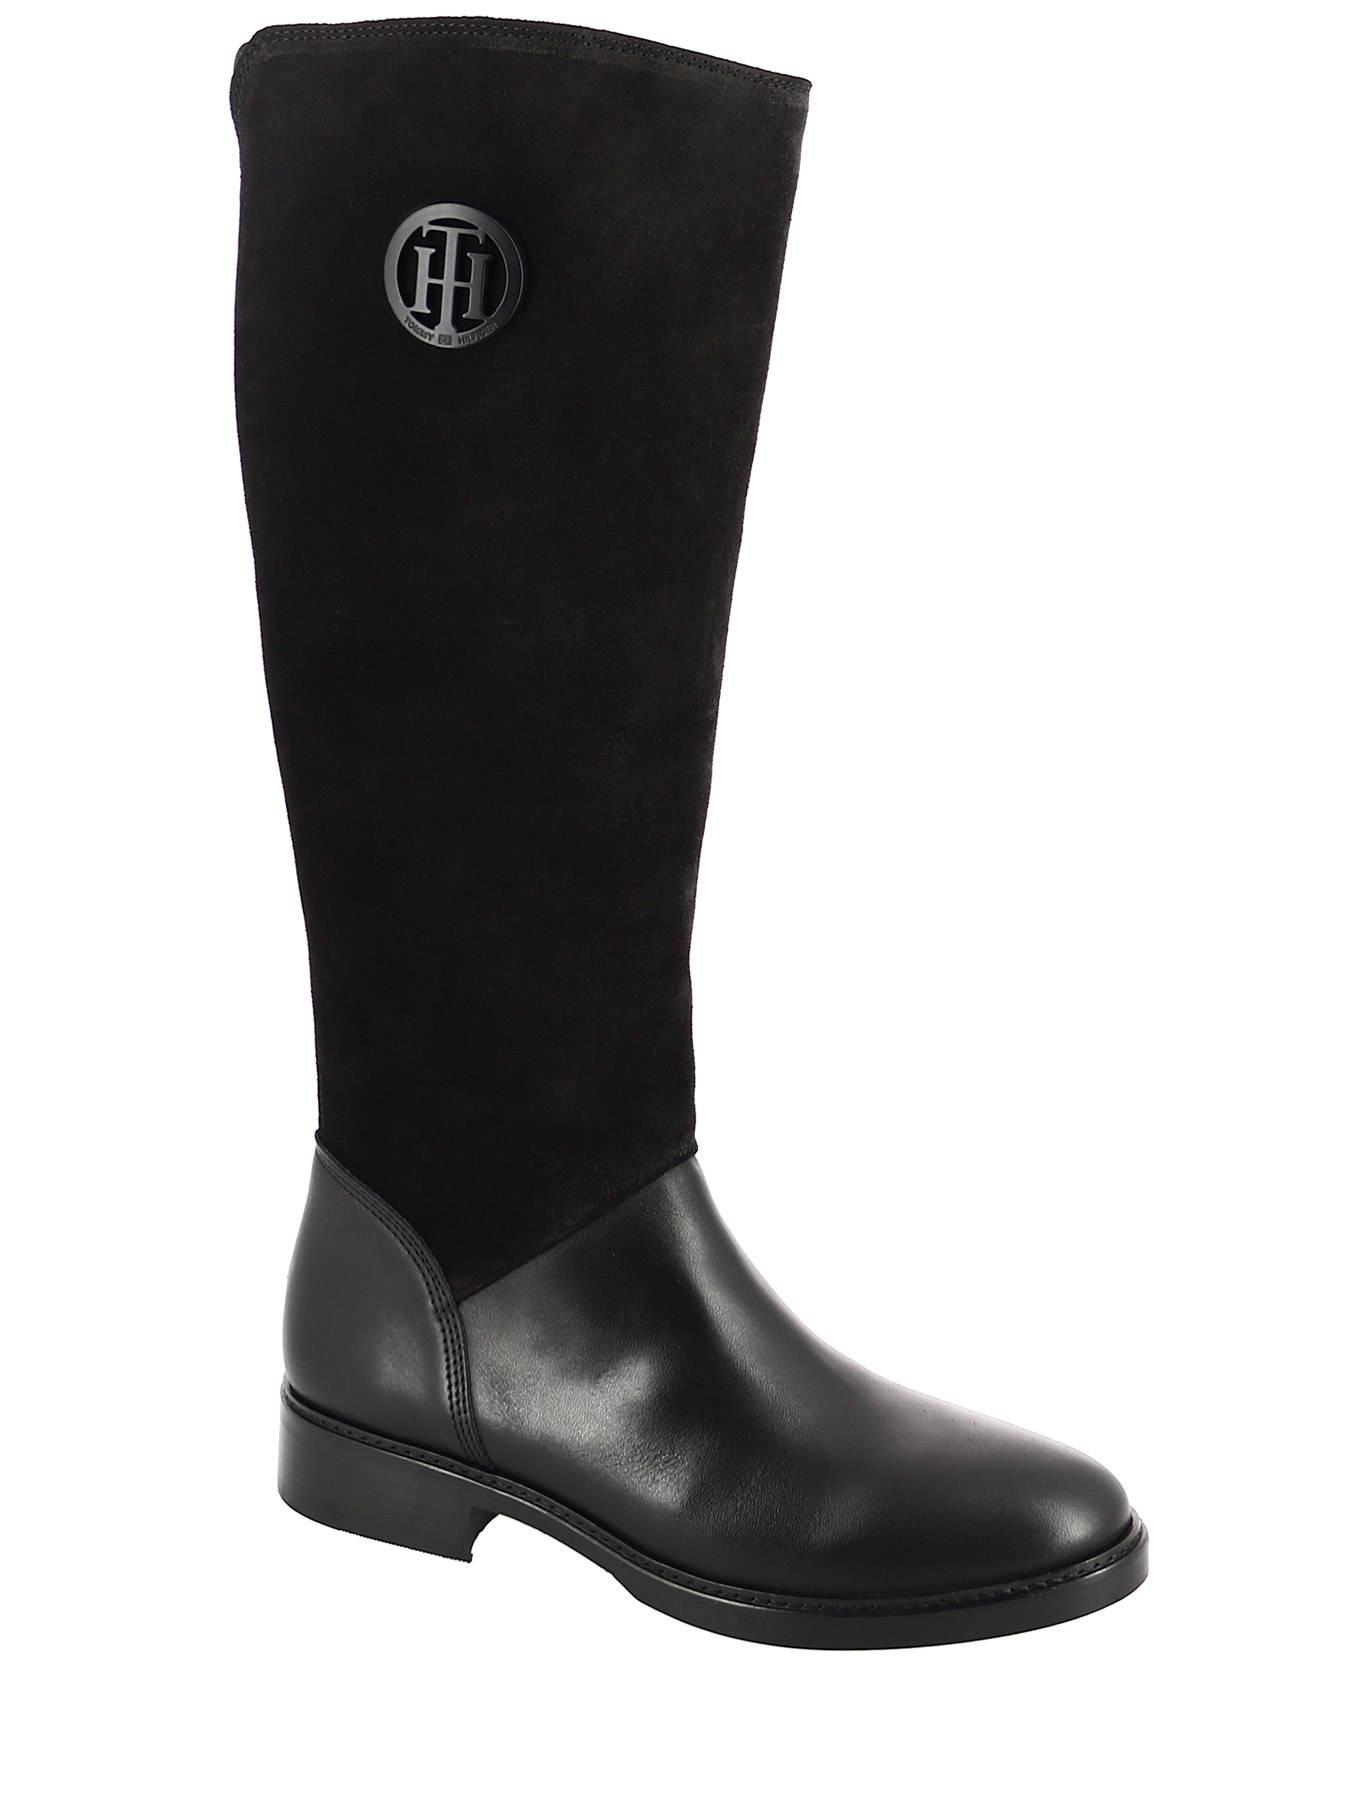 a742dd119 Tommy Hilfiger Boots BSC.TH.RDG.B.MX on edisac.com